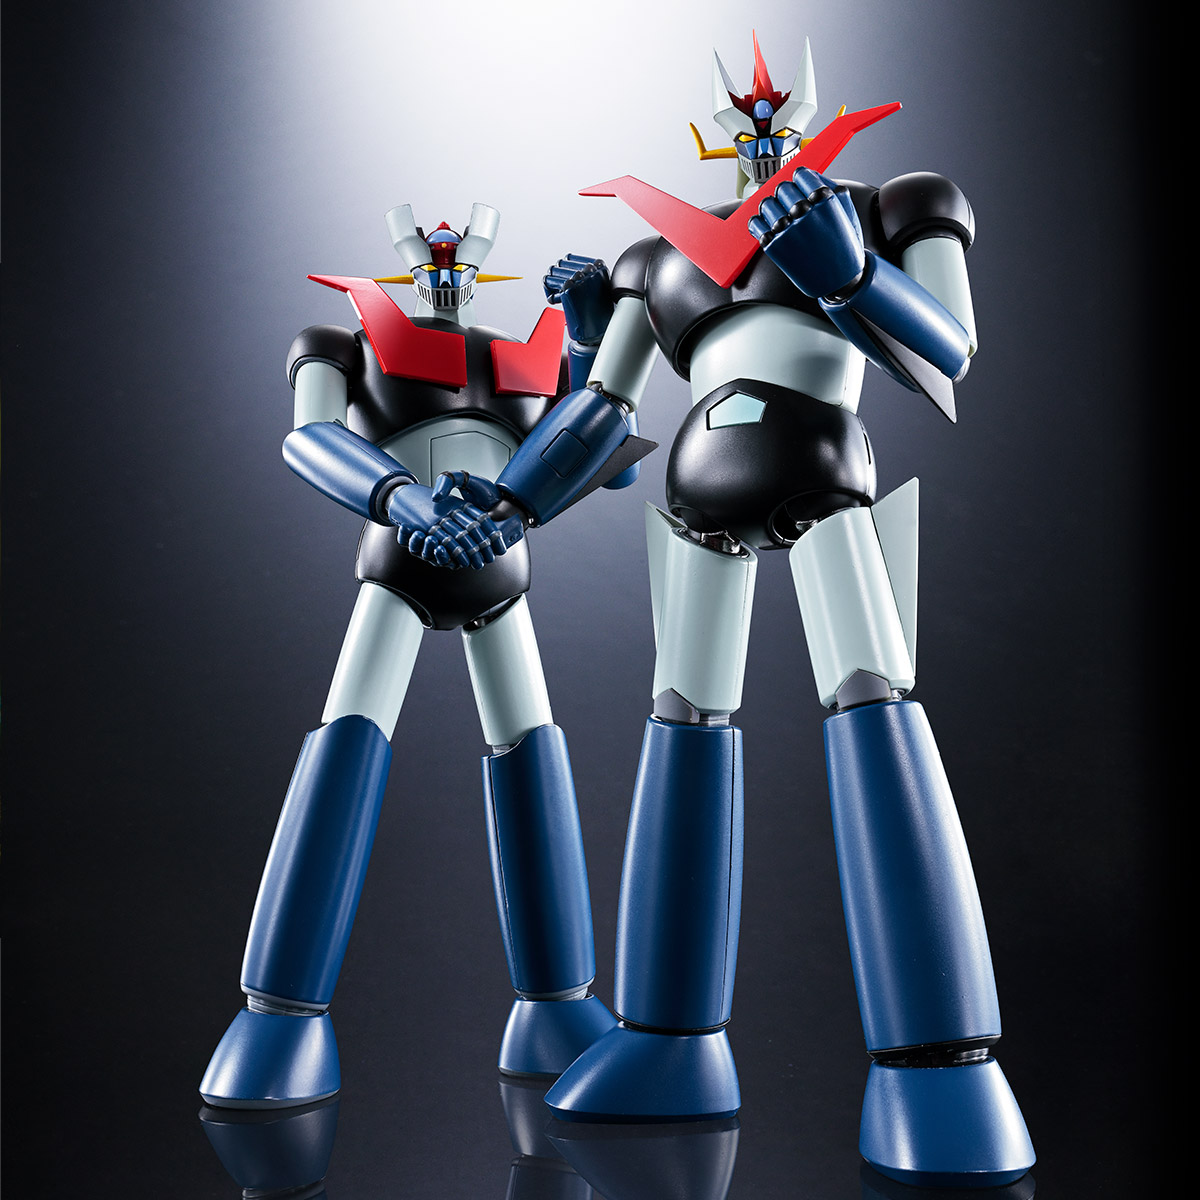 SOUL OF CHOGOKIN GX-73SP GREAT MAZINGER D.C. Anime Color Version